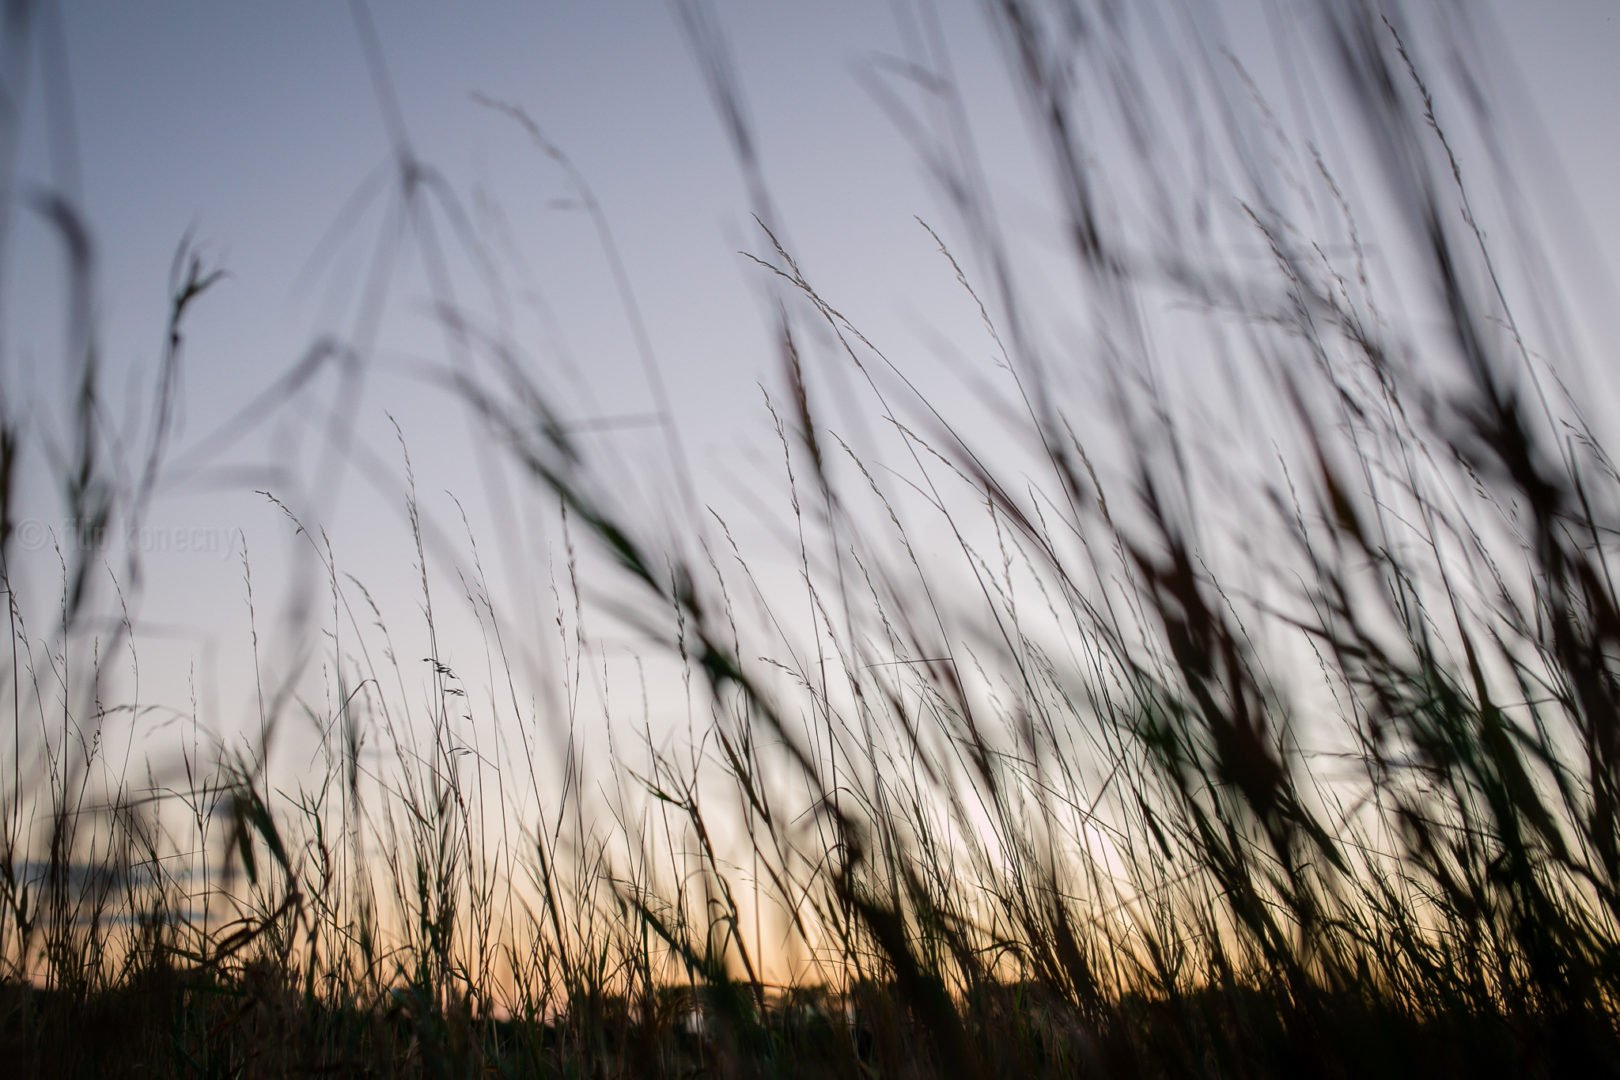 field of grass against sunset sky